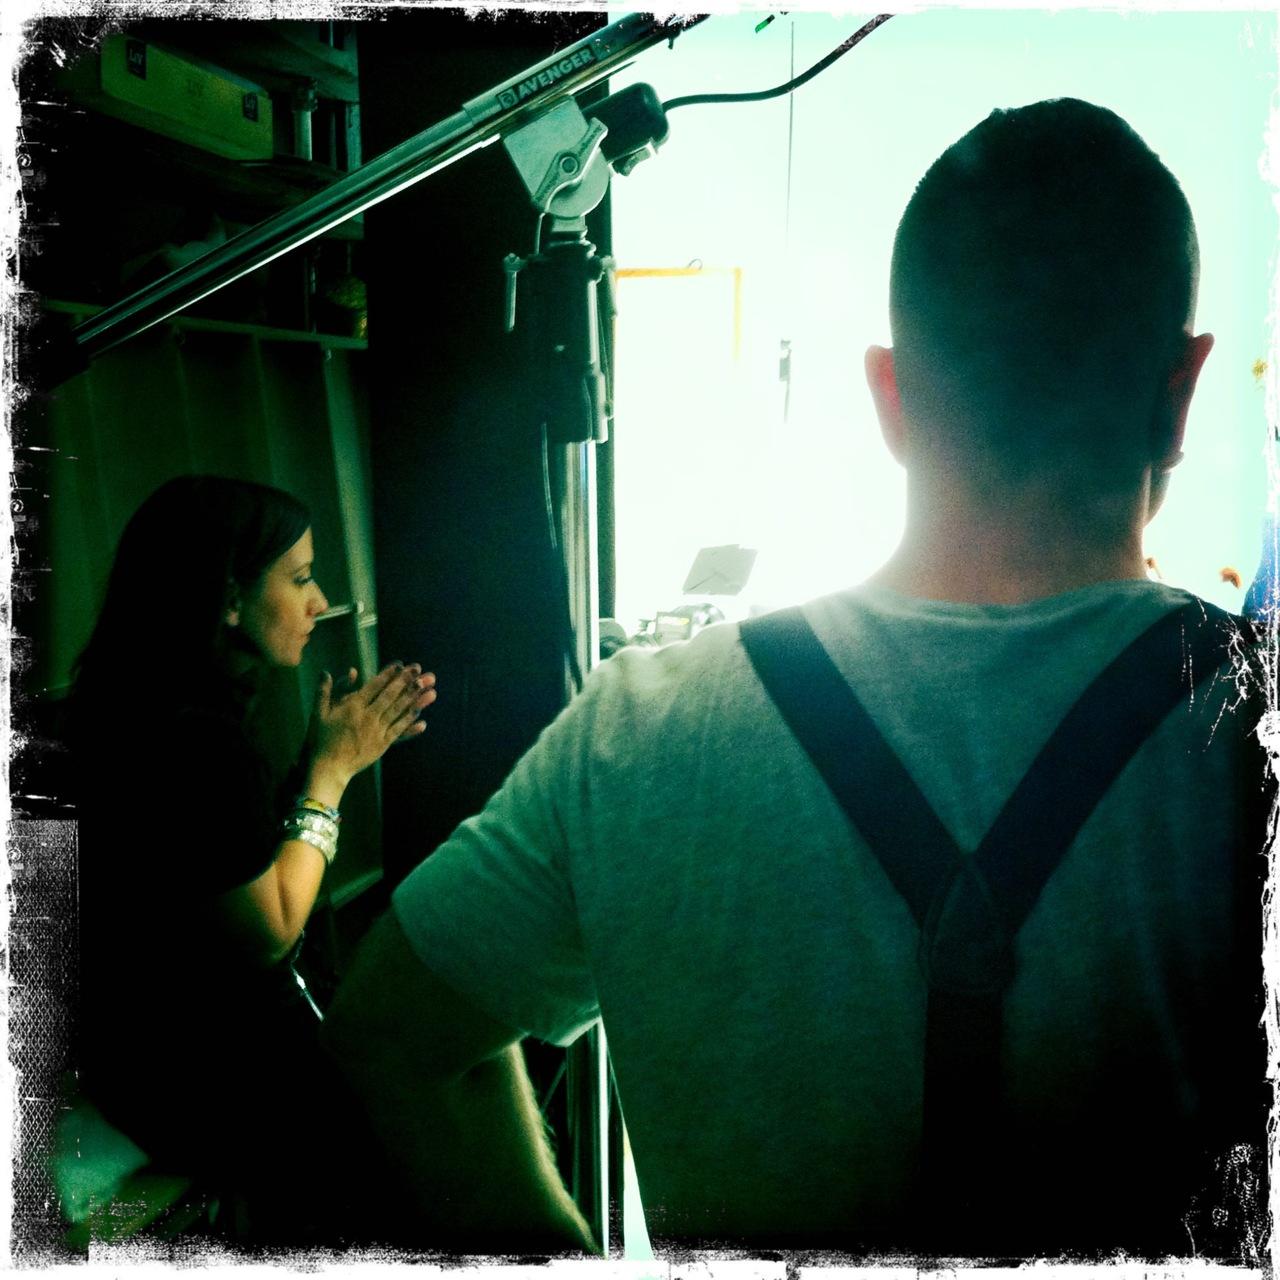 @sarahmccolgan and @LegendaryDamon creating the magic!